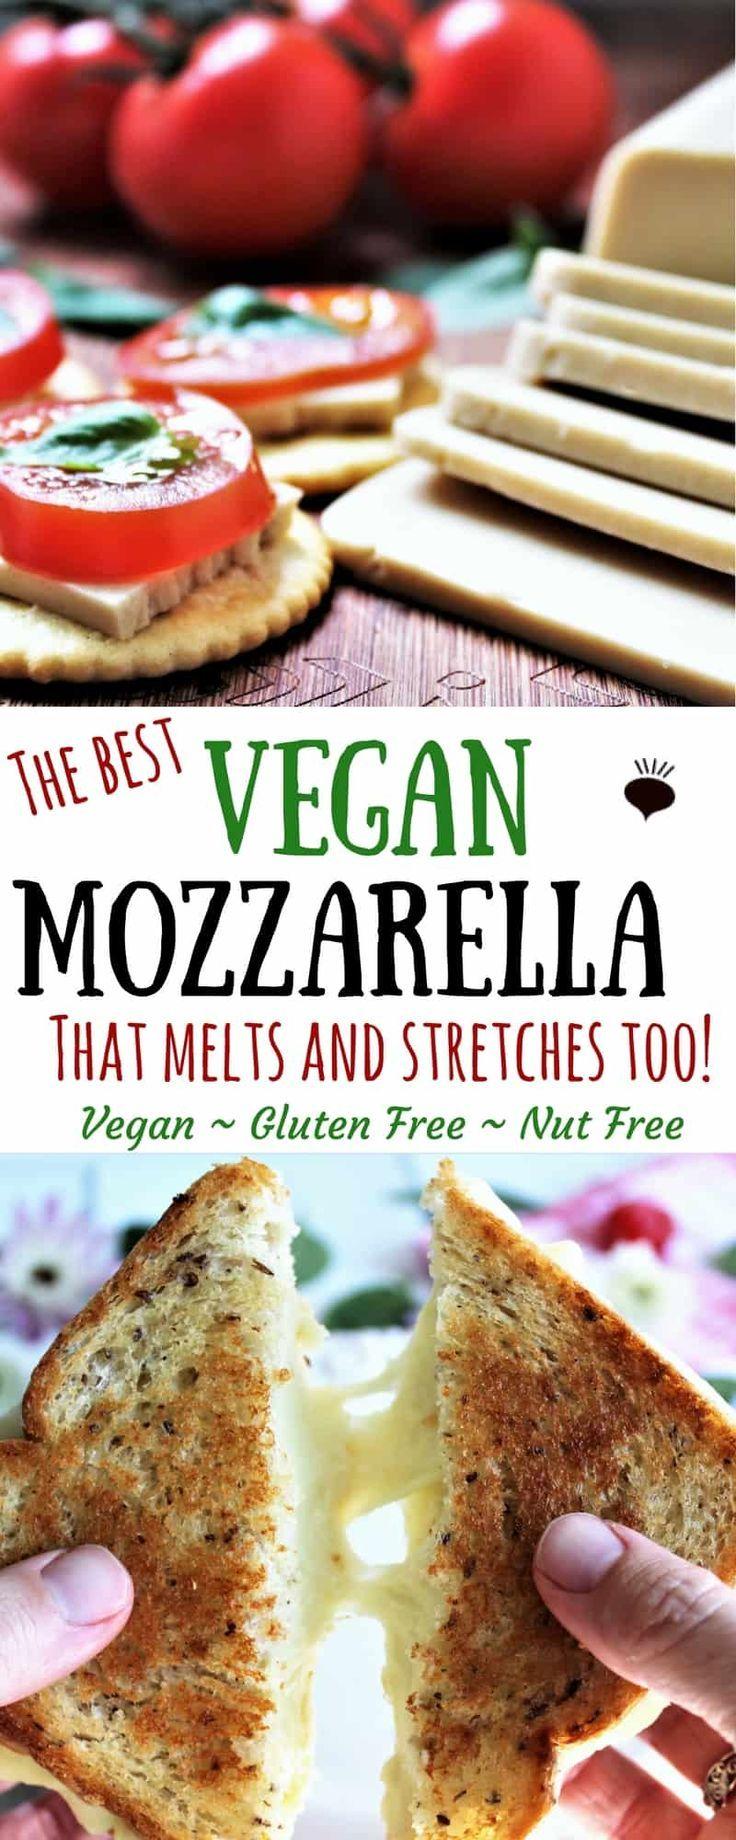 How To Make Vegan Mozzarella Cheese In 2020 Vegan Cheese Recipes Vegan Mozzarella Vegan Pizza Cheese